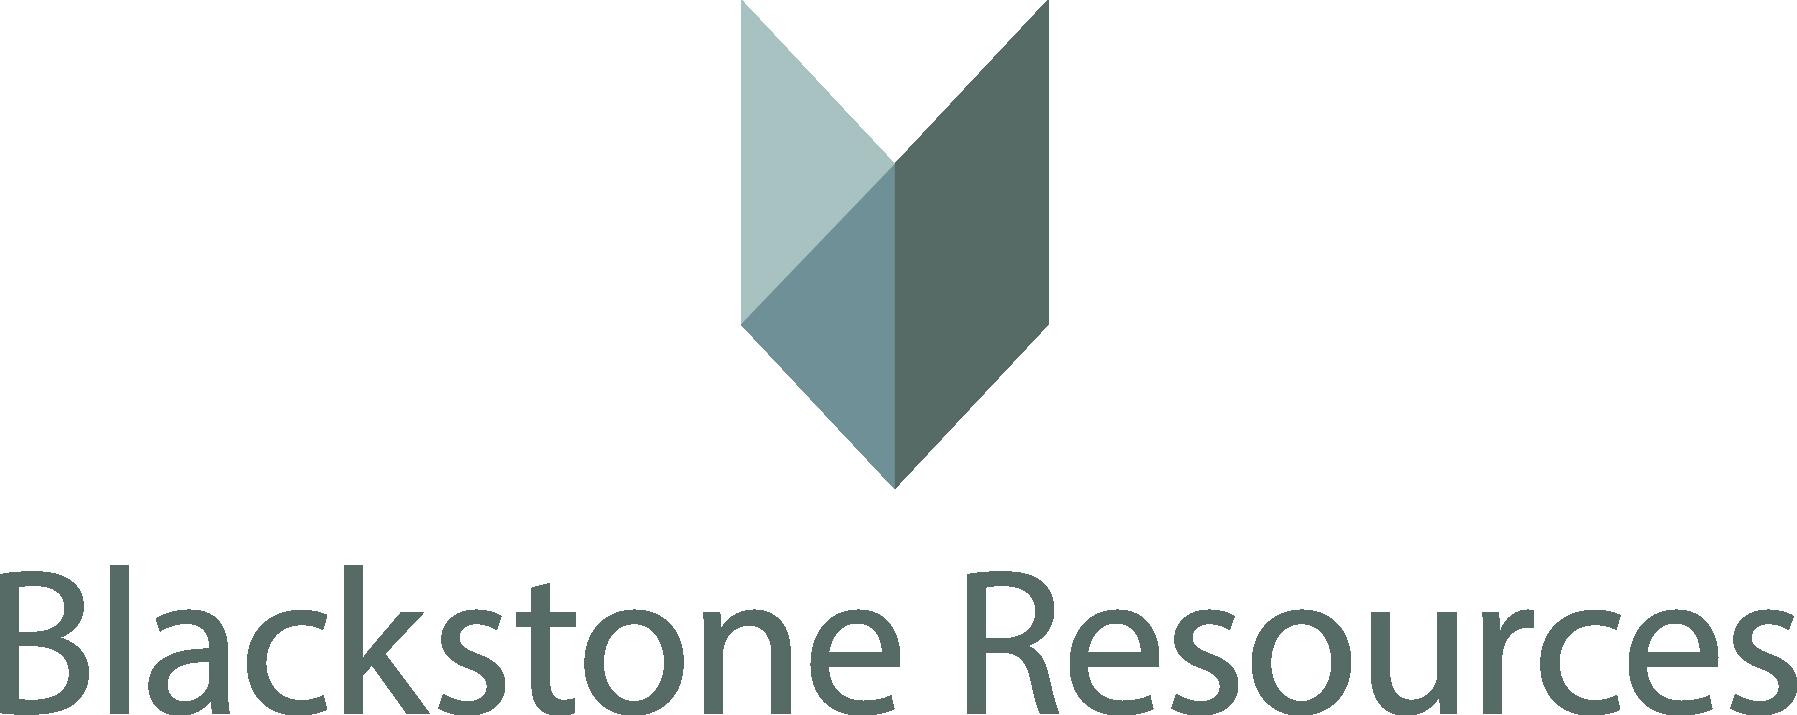 Blackstone Resources Management AG